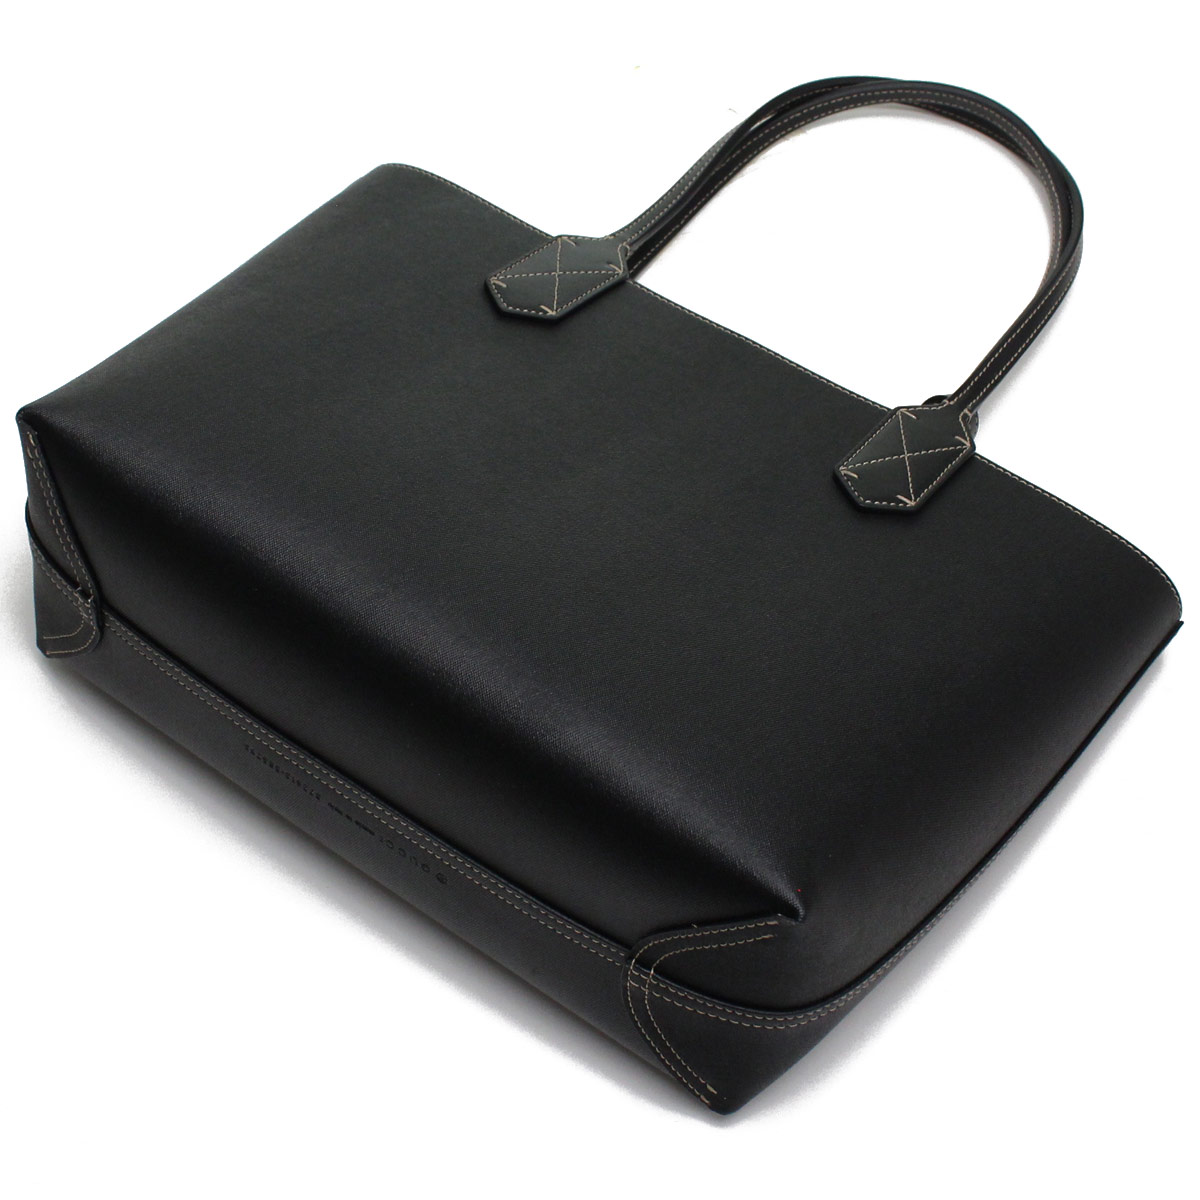 8c11bcfff9bc1c Bighit The total brand wholesale: Gucci GUCCI reversible tote bag ...